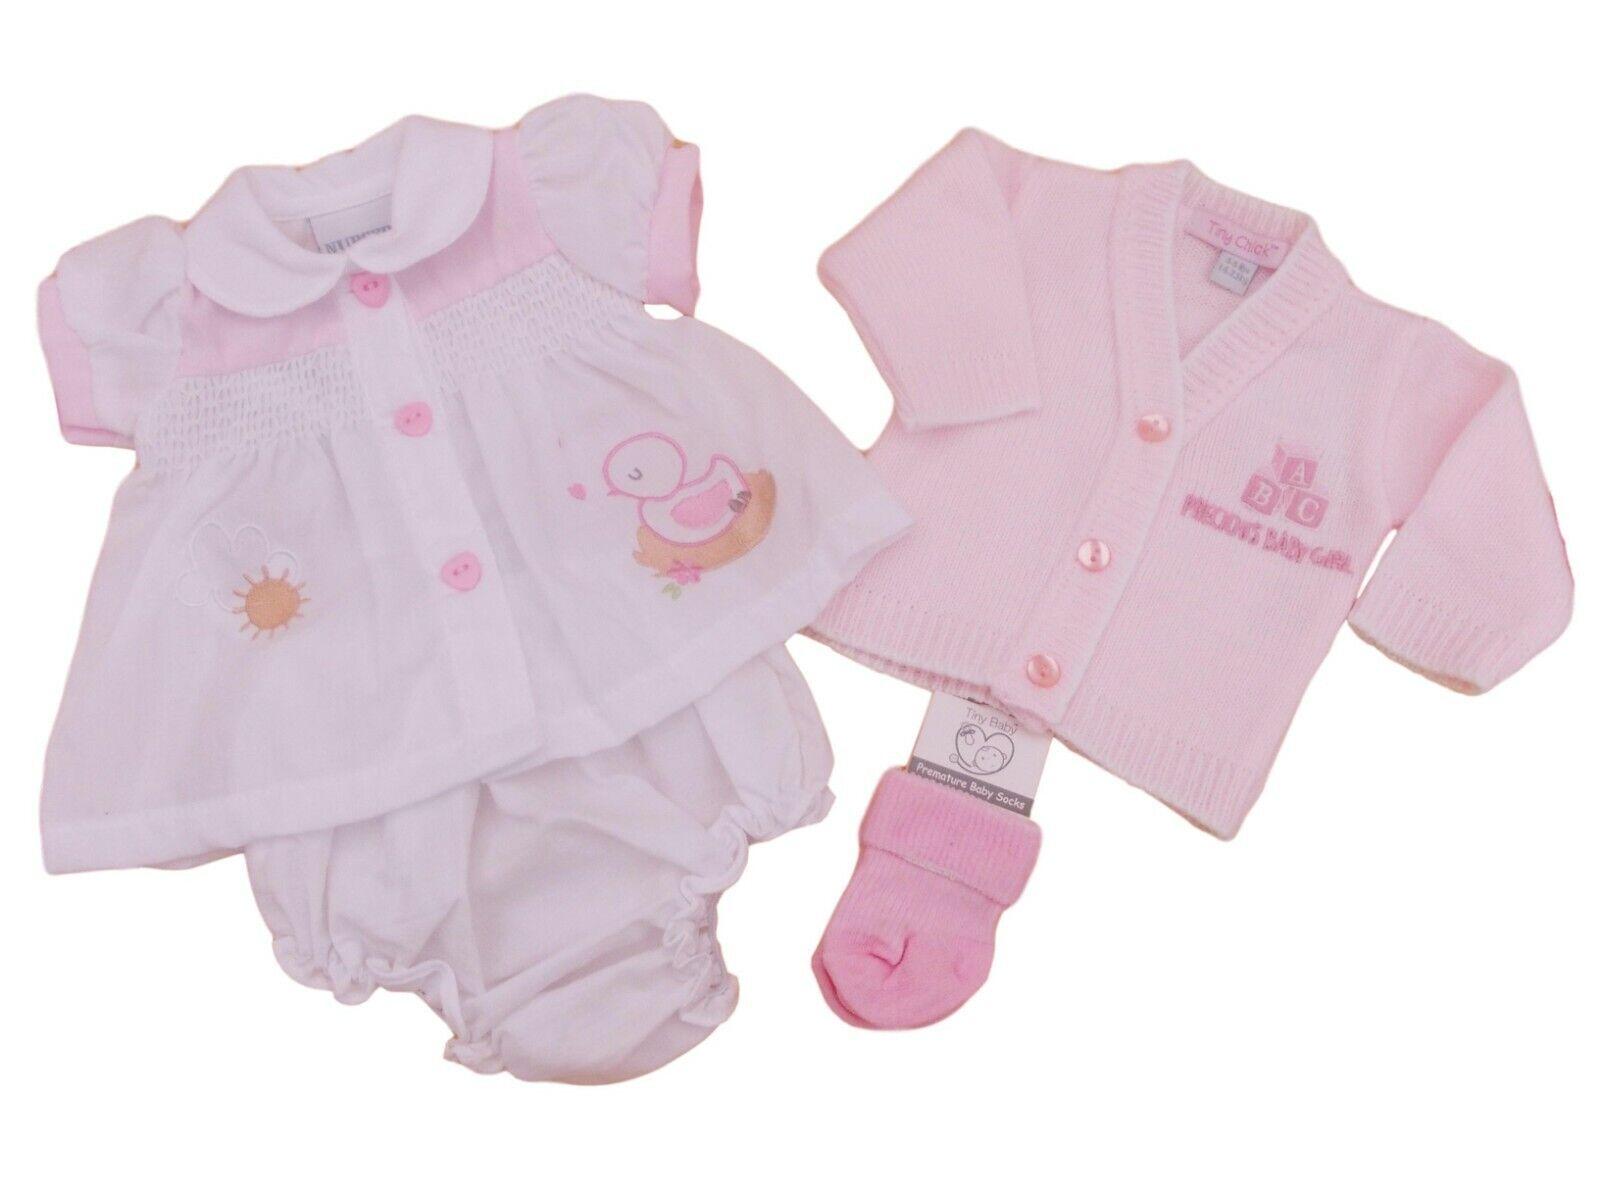 BNWT Tiny Premature Preemie Baby Girl Little teacup summer dress 3-5lb /& 5-8lb